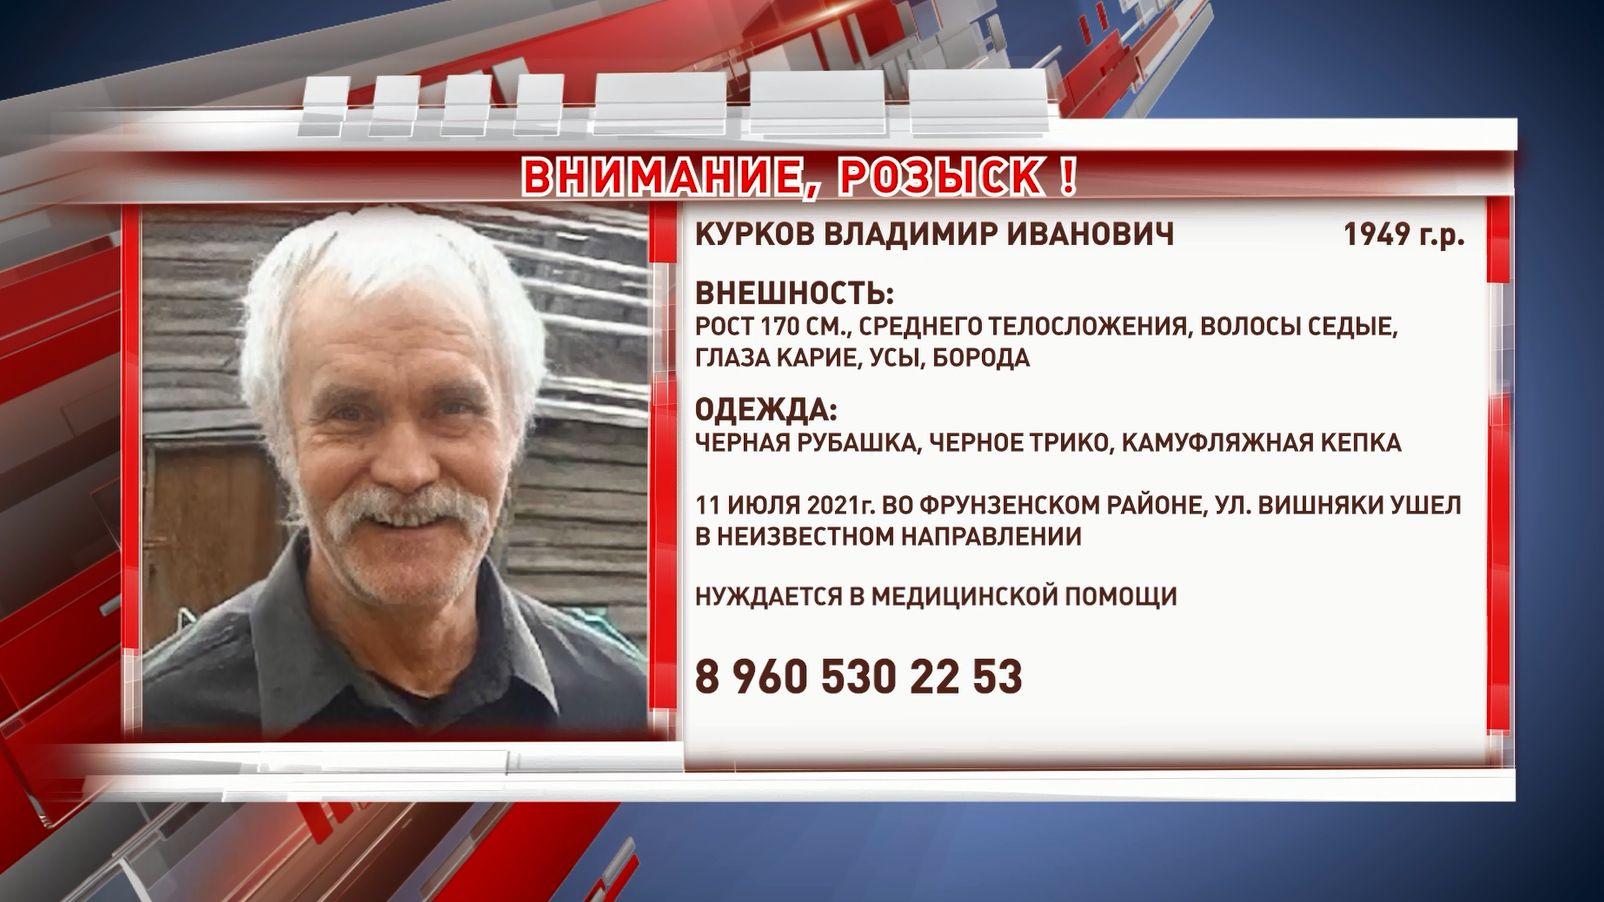 В Ярославле пропал 72-летний пенсионер